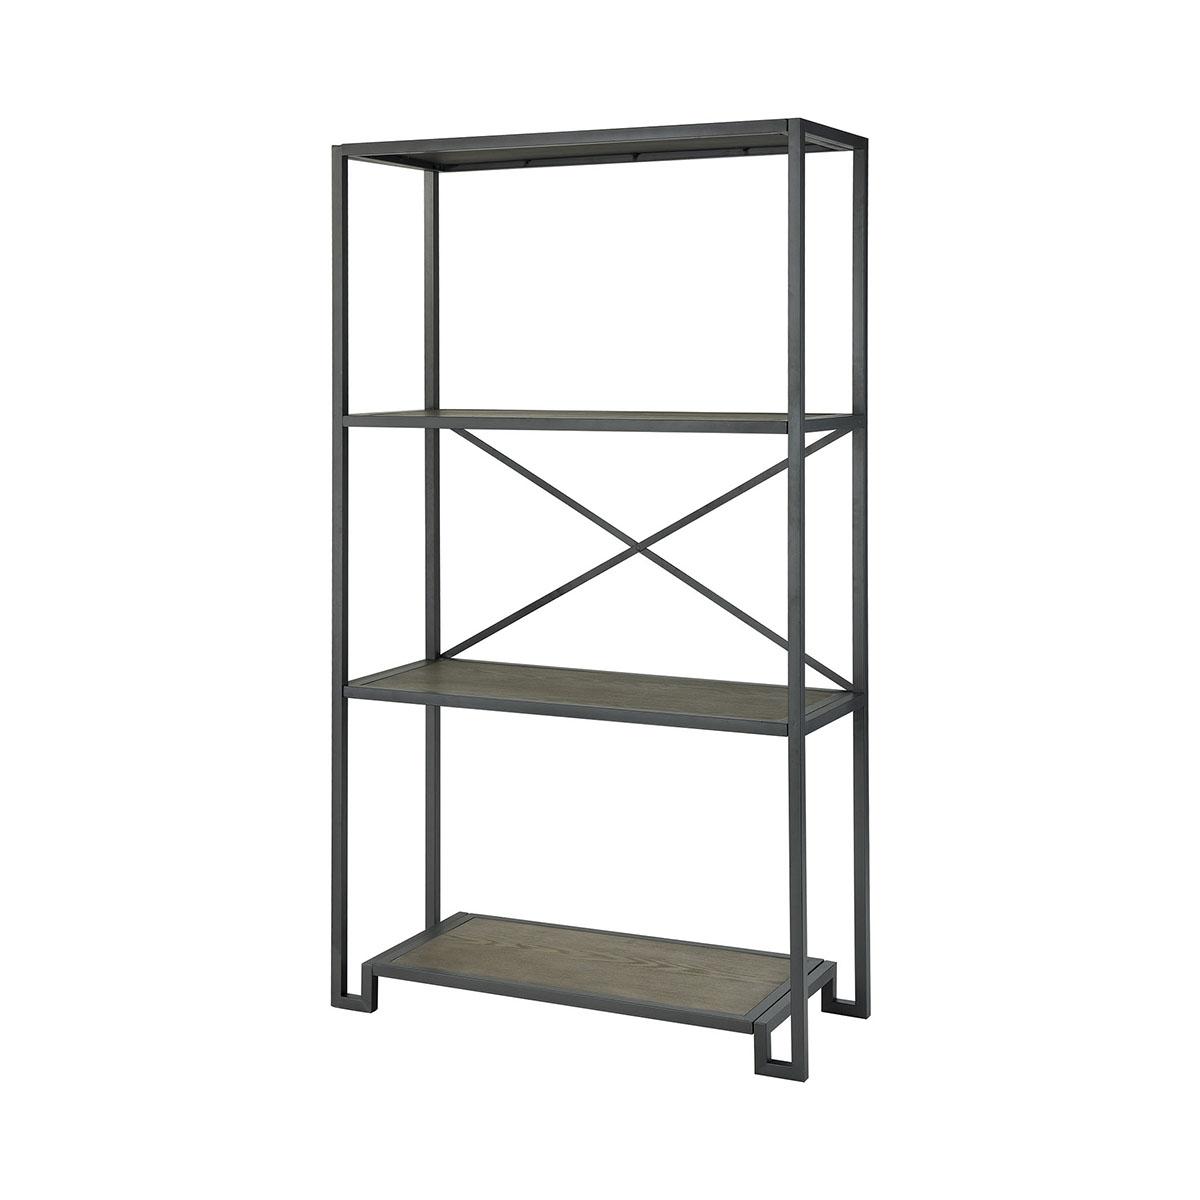 Mezzanine Shelving Unit 16865 | ELK Home